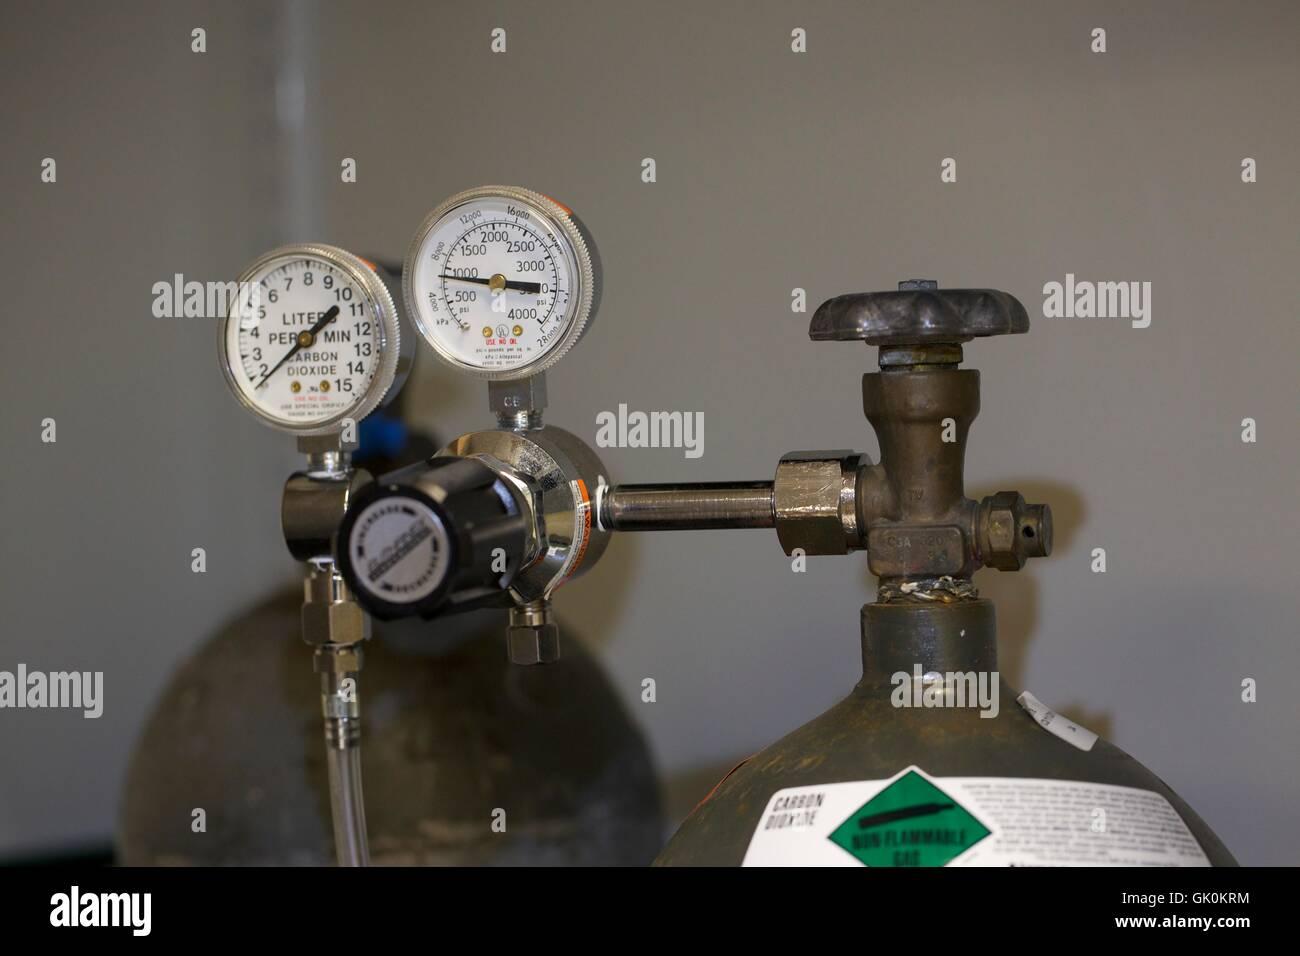 Pressure gauge and valve on carbon dioxide tank. - Stock Image